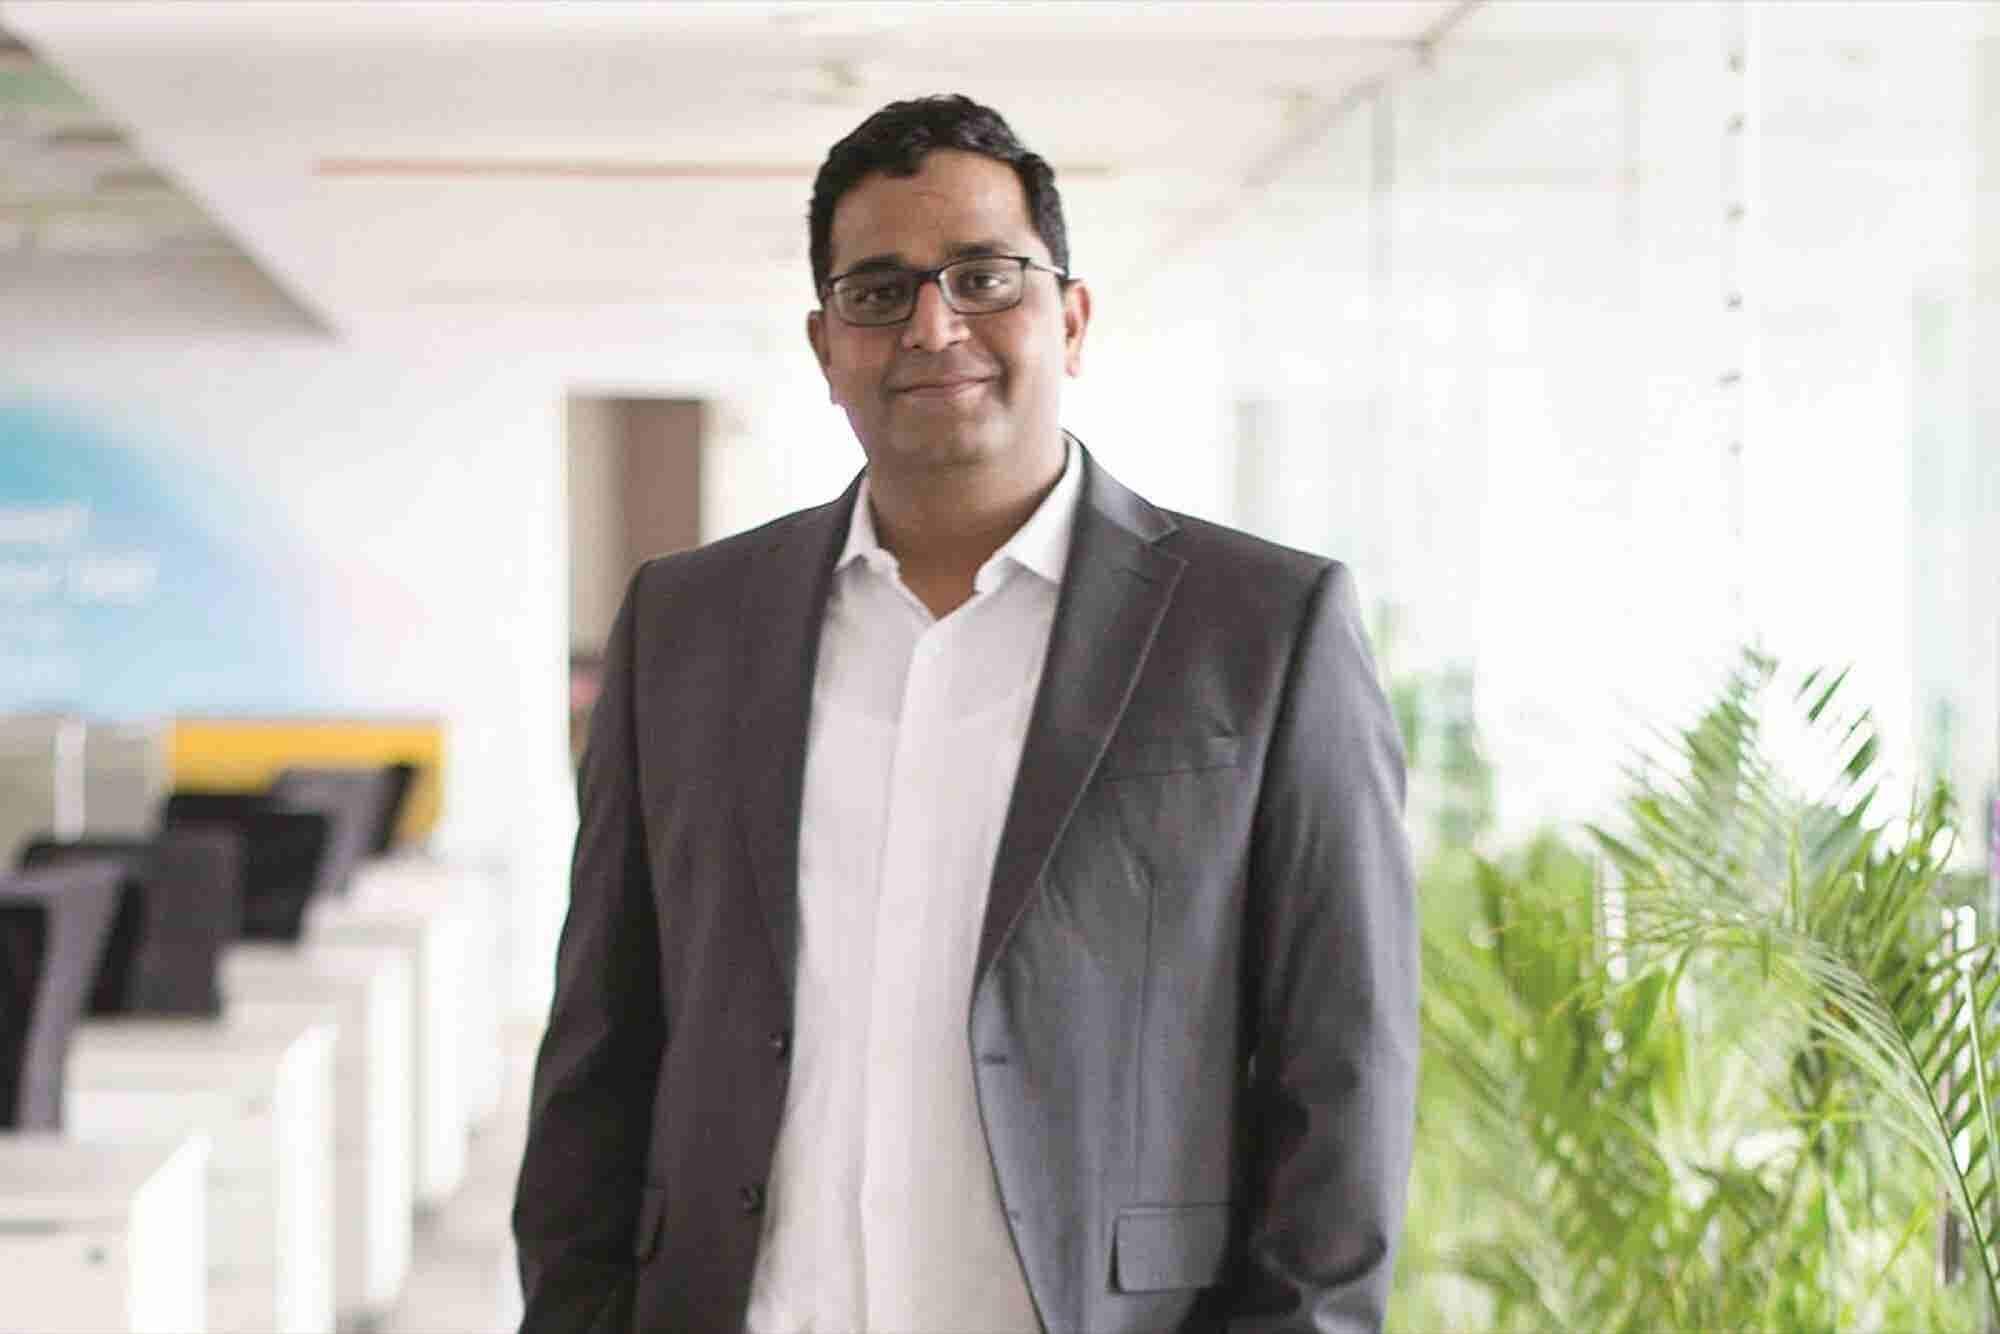 Vijay Shekhar Sharma's Massive Fund & PM Modi's Message for Entrepreneurs. 4 Things to Know Today.